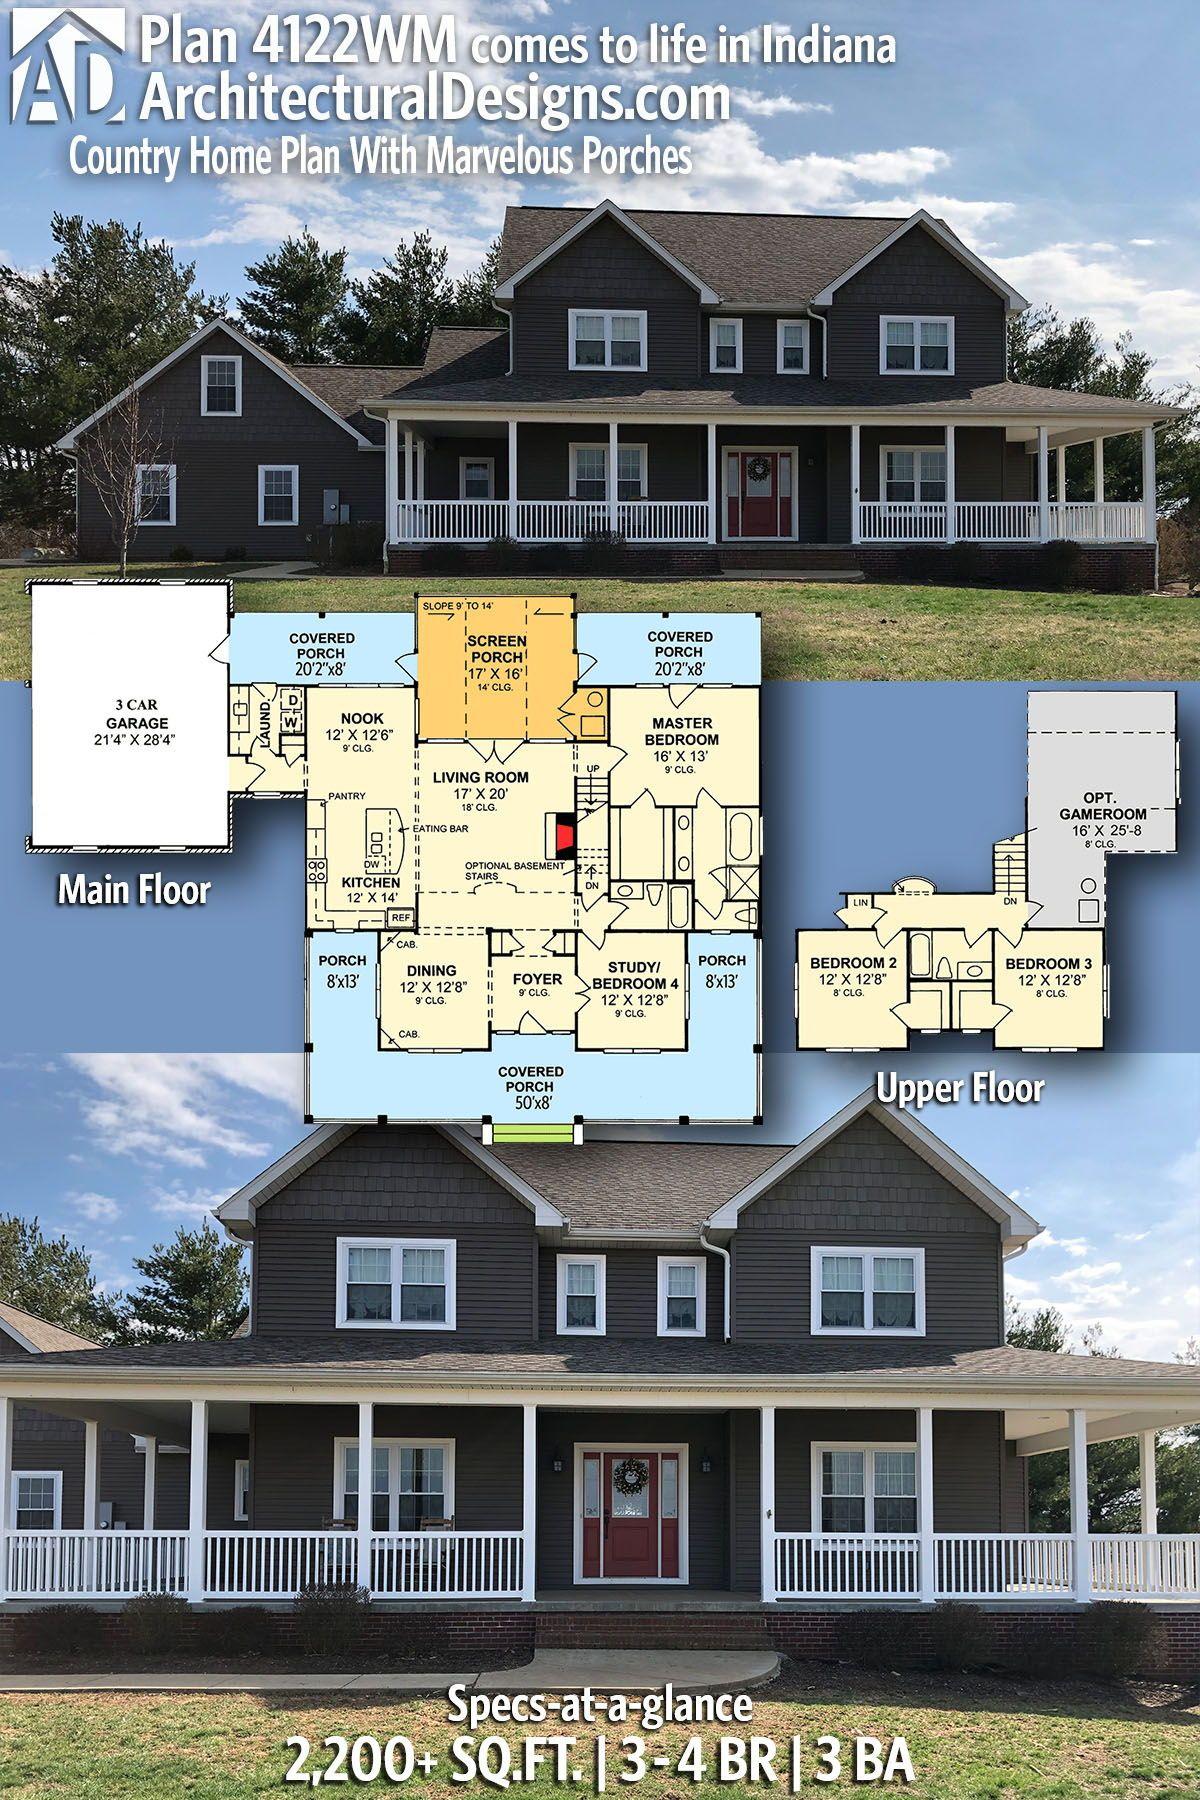 37+ 4122wm house plan type